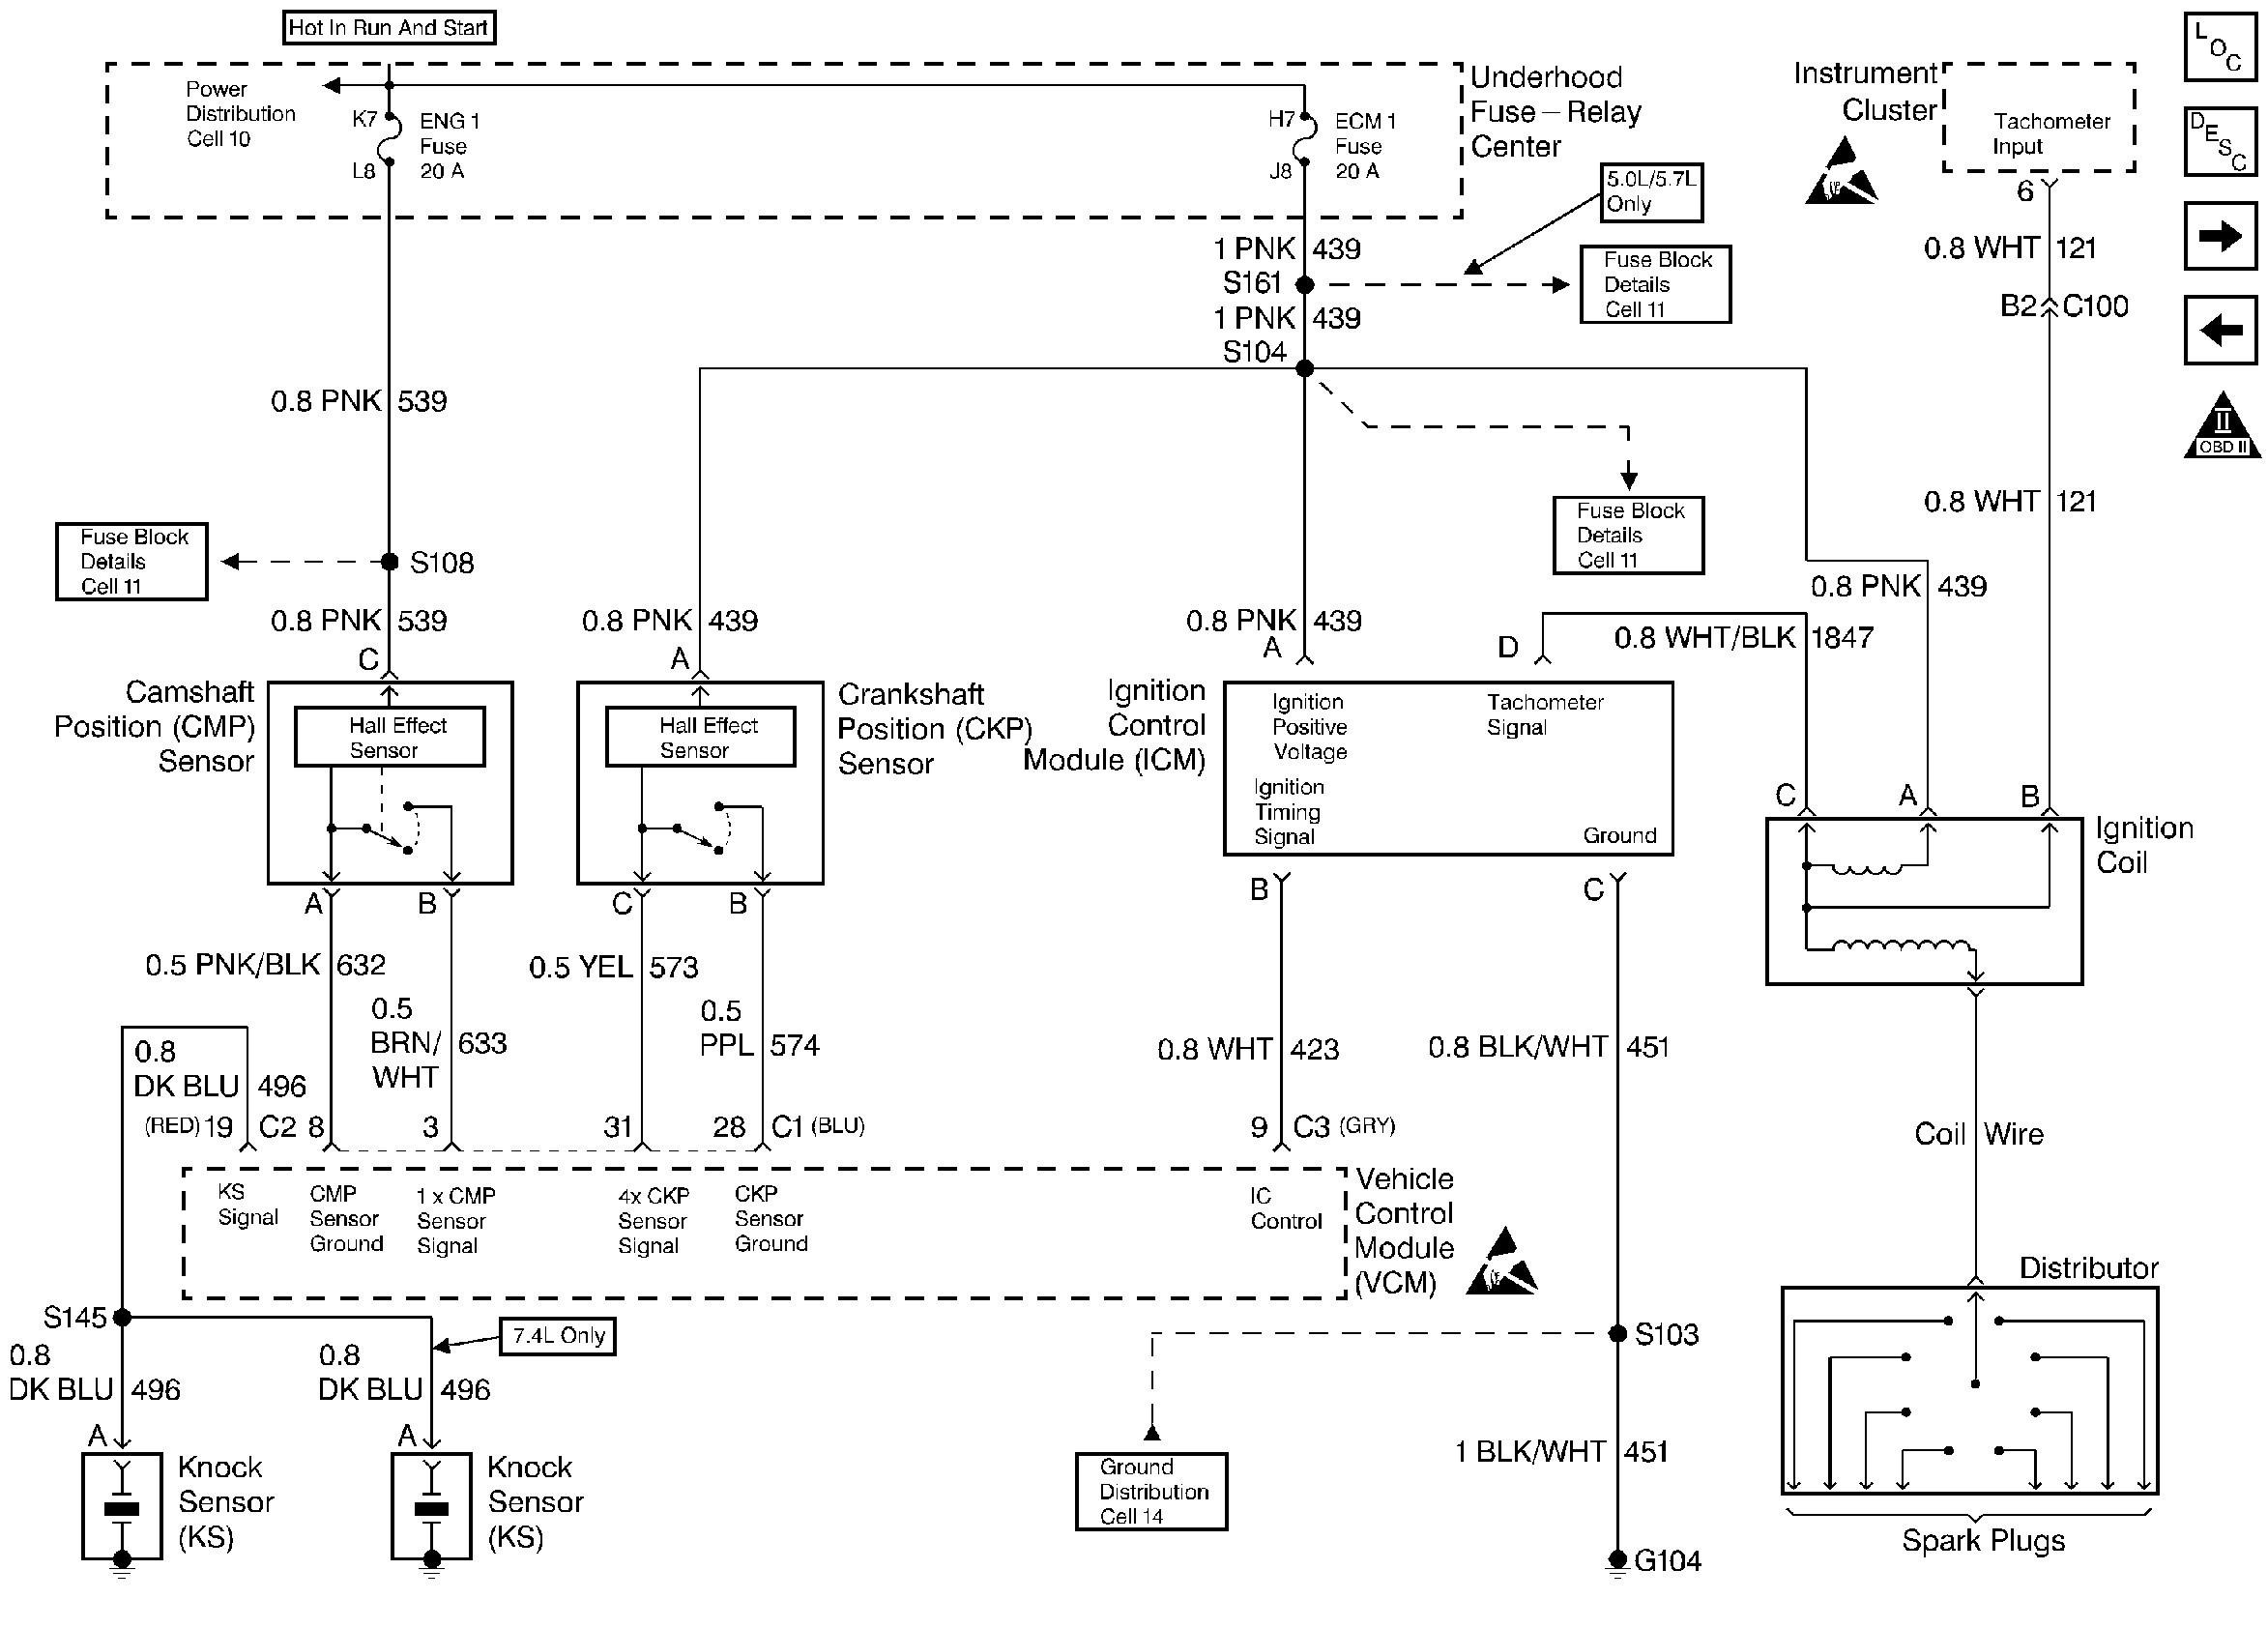 5 3 Liter Engine Diagram Good Guide Of Wiring Problems With Ford 7 8 1 Vortec Change Your Idea Rh Voice Bridgesgi Com Chrysler 35